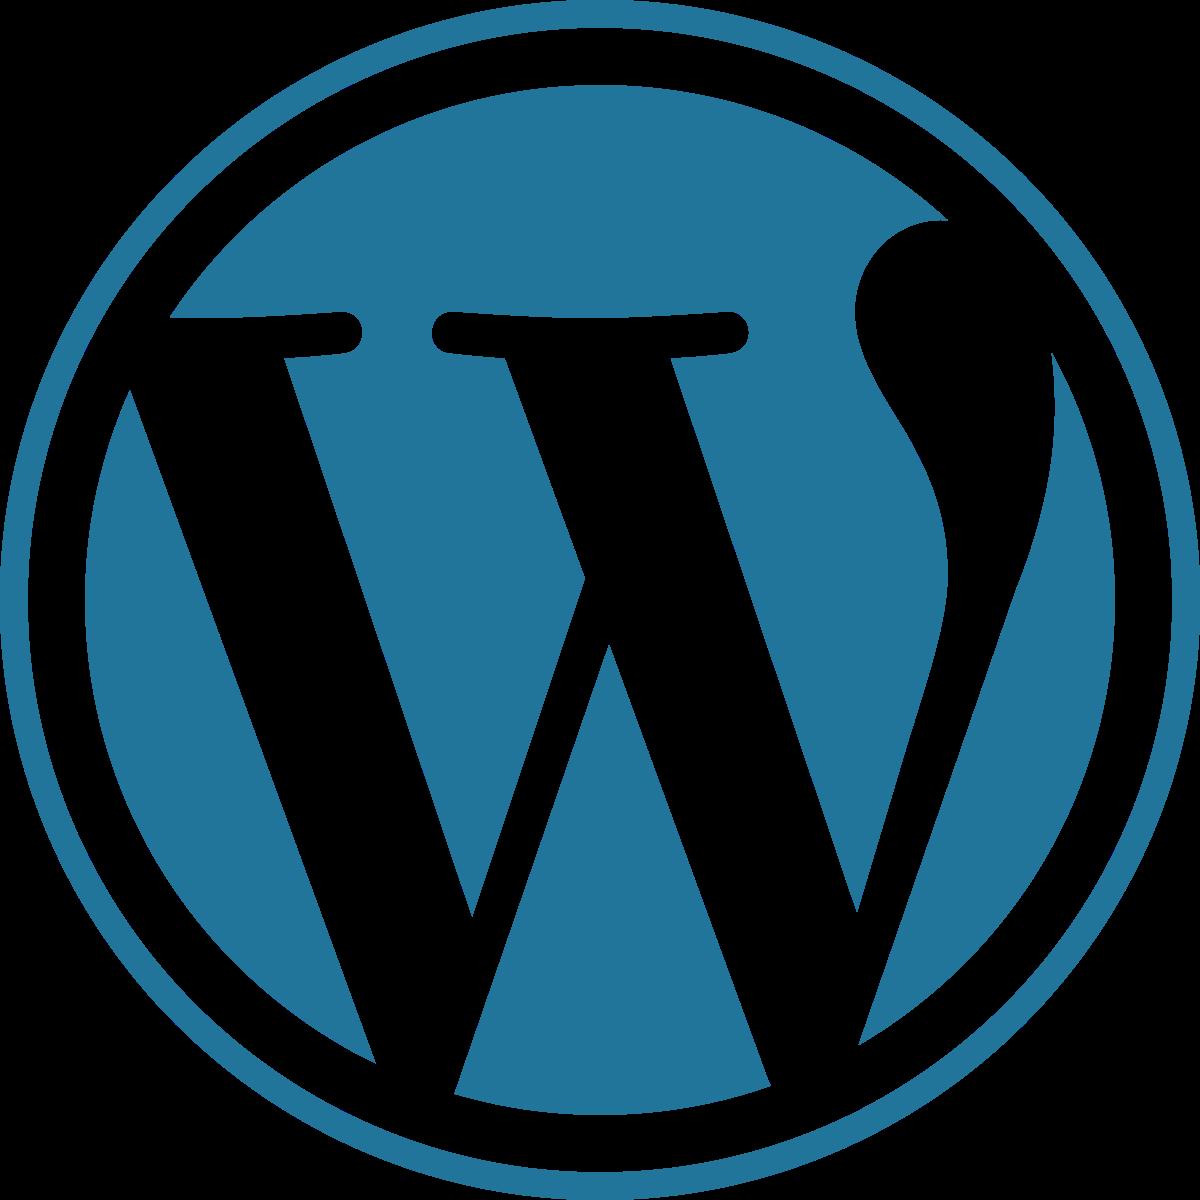 thumb_WDMyCloud_WordPress_4.7.2.png